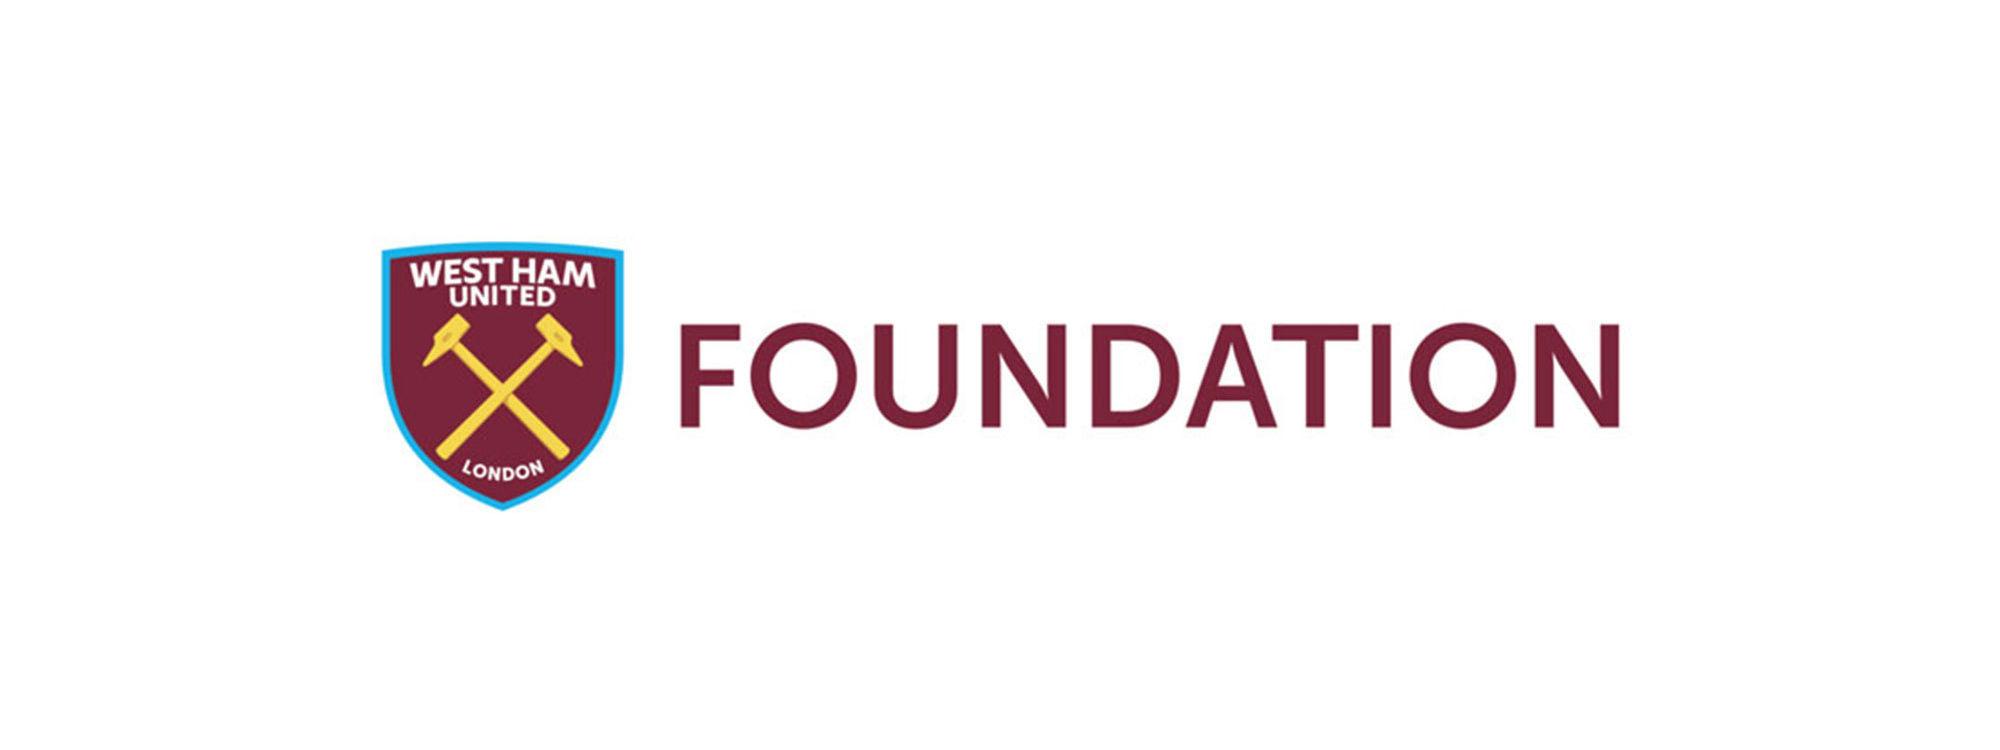 Foundation logo726